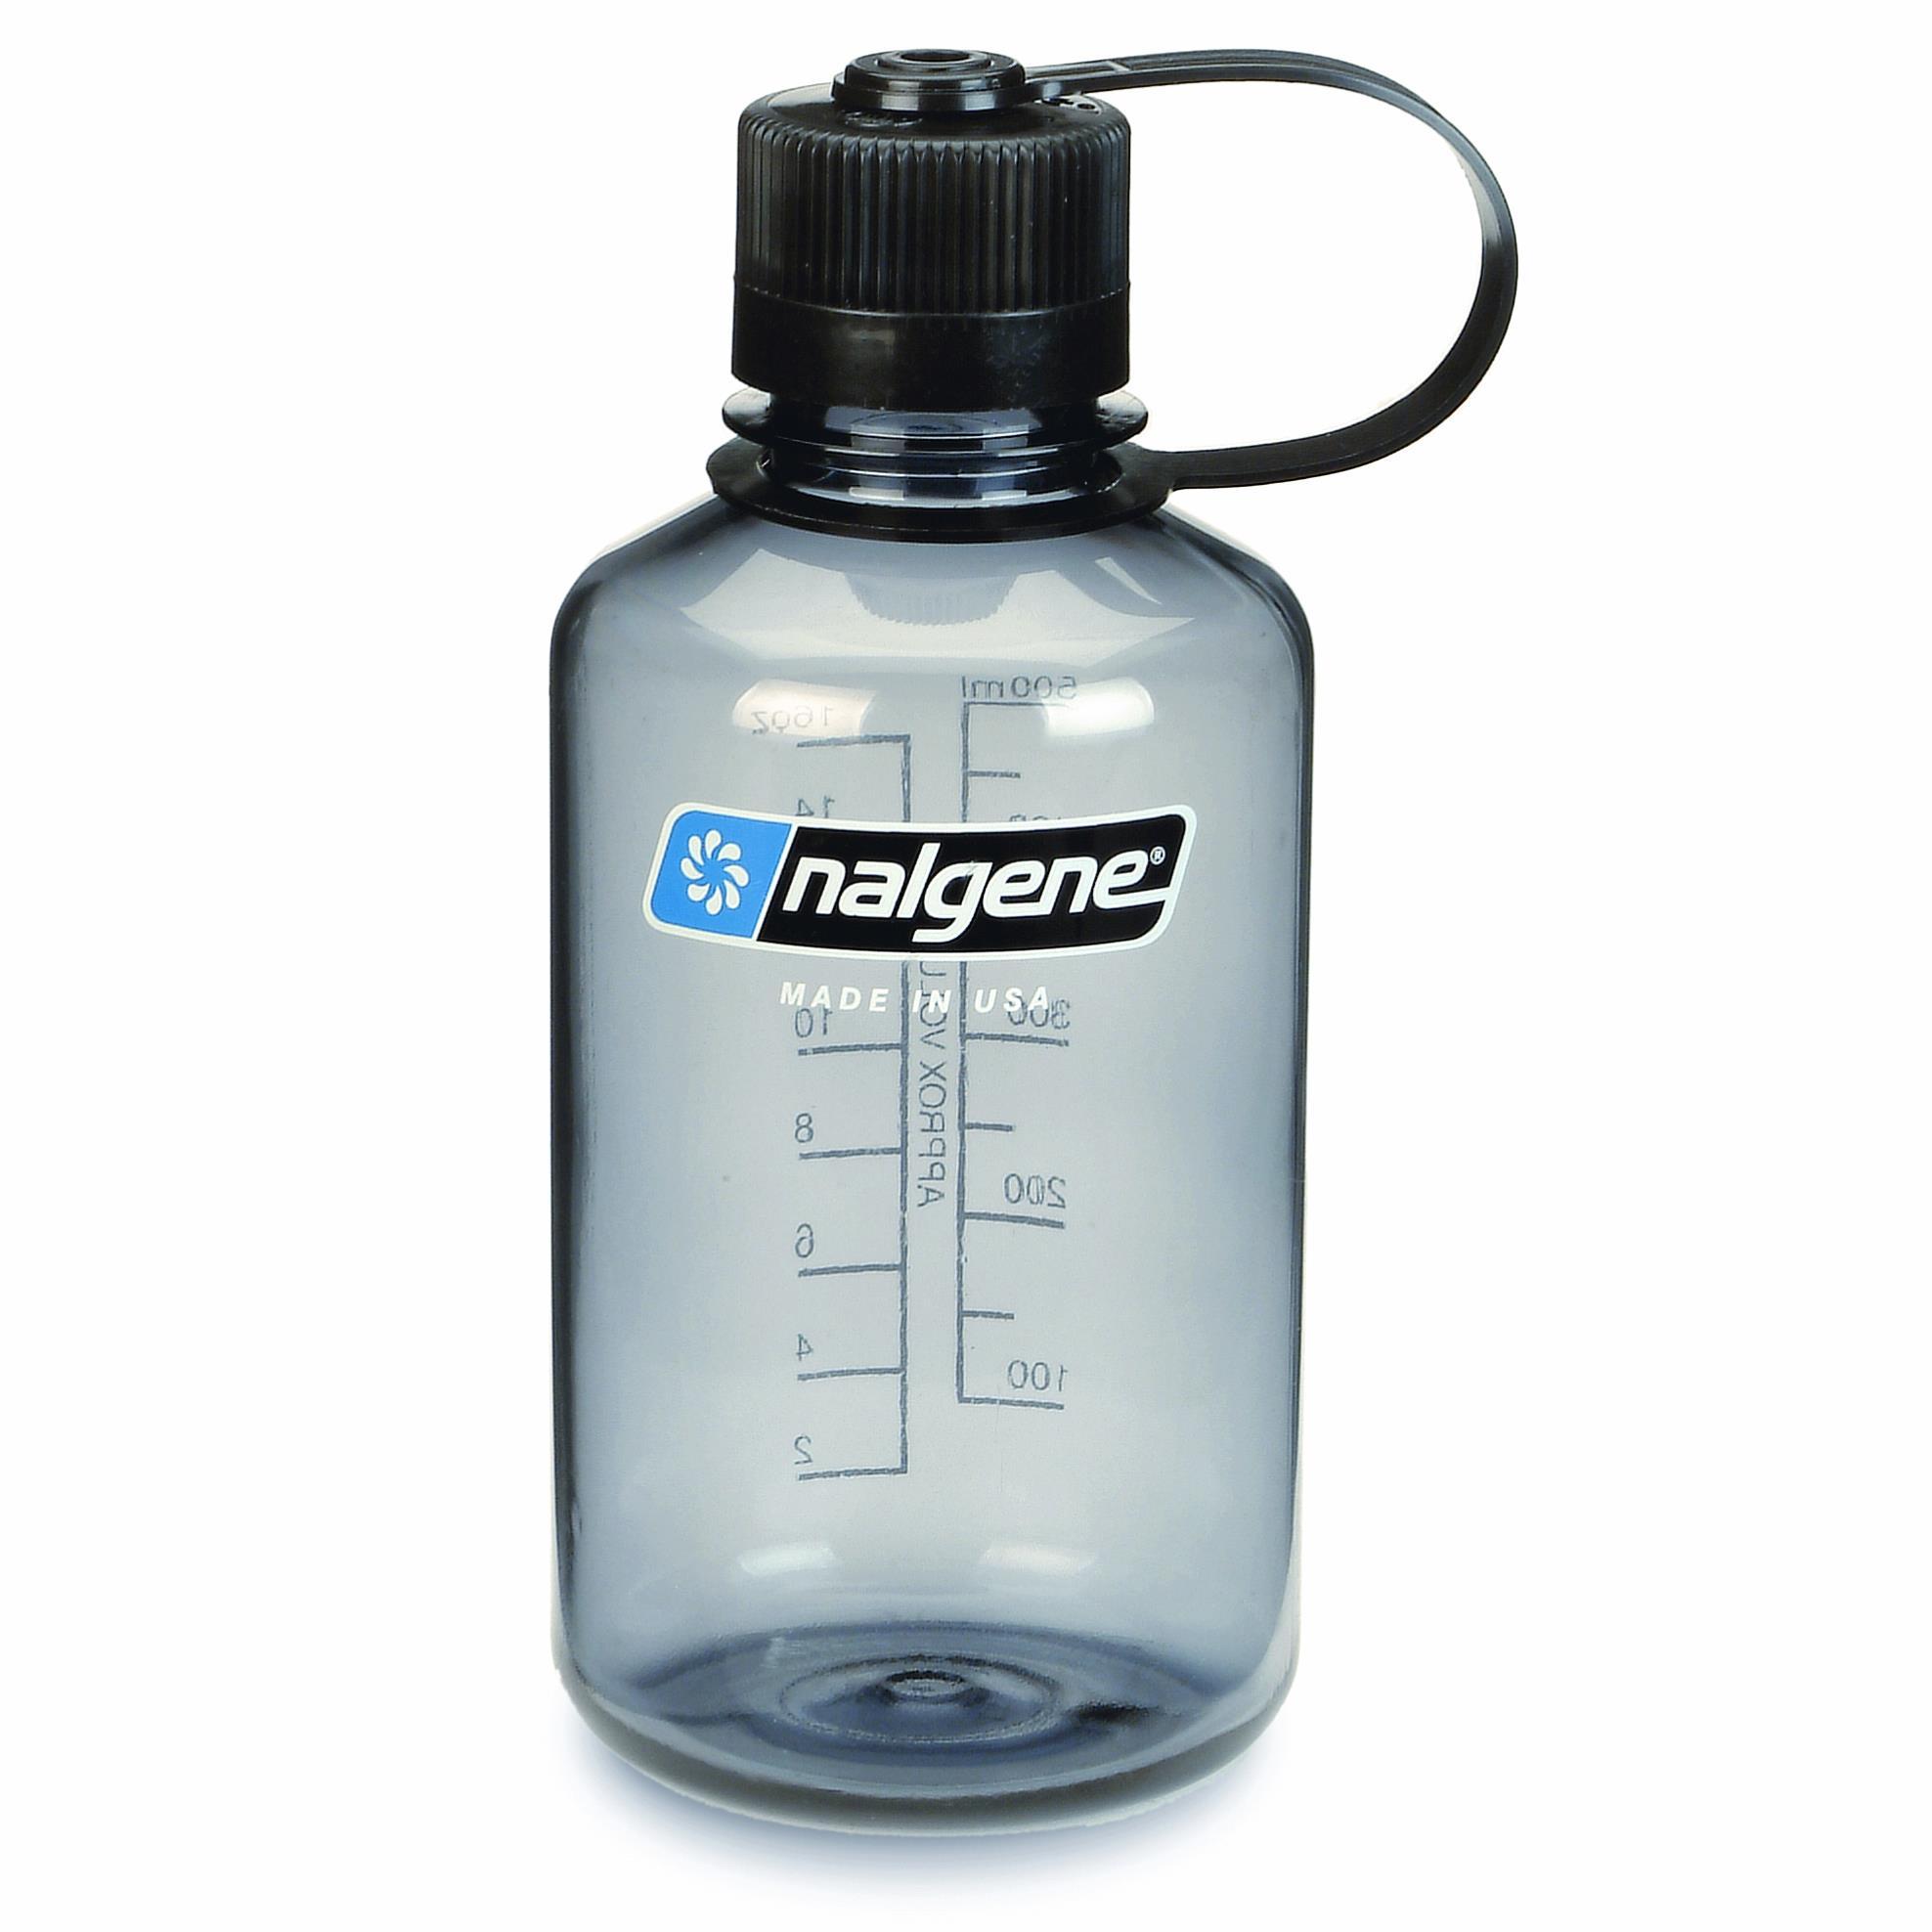 nalgene Flasche Everyday grau